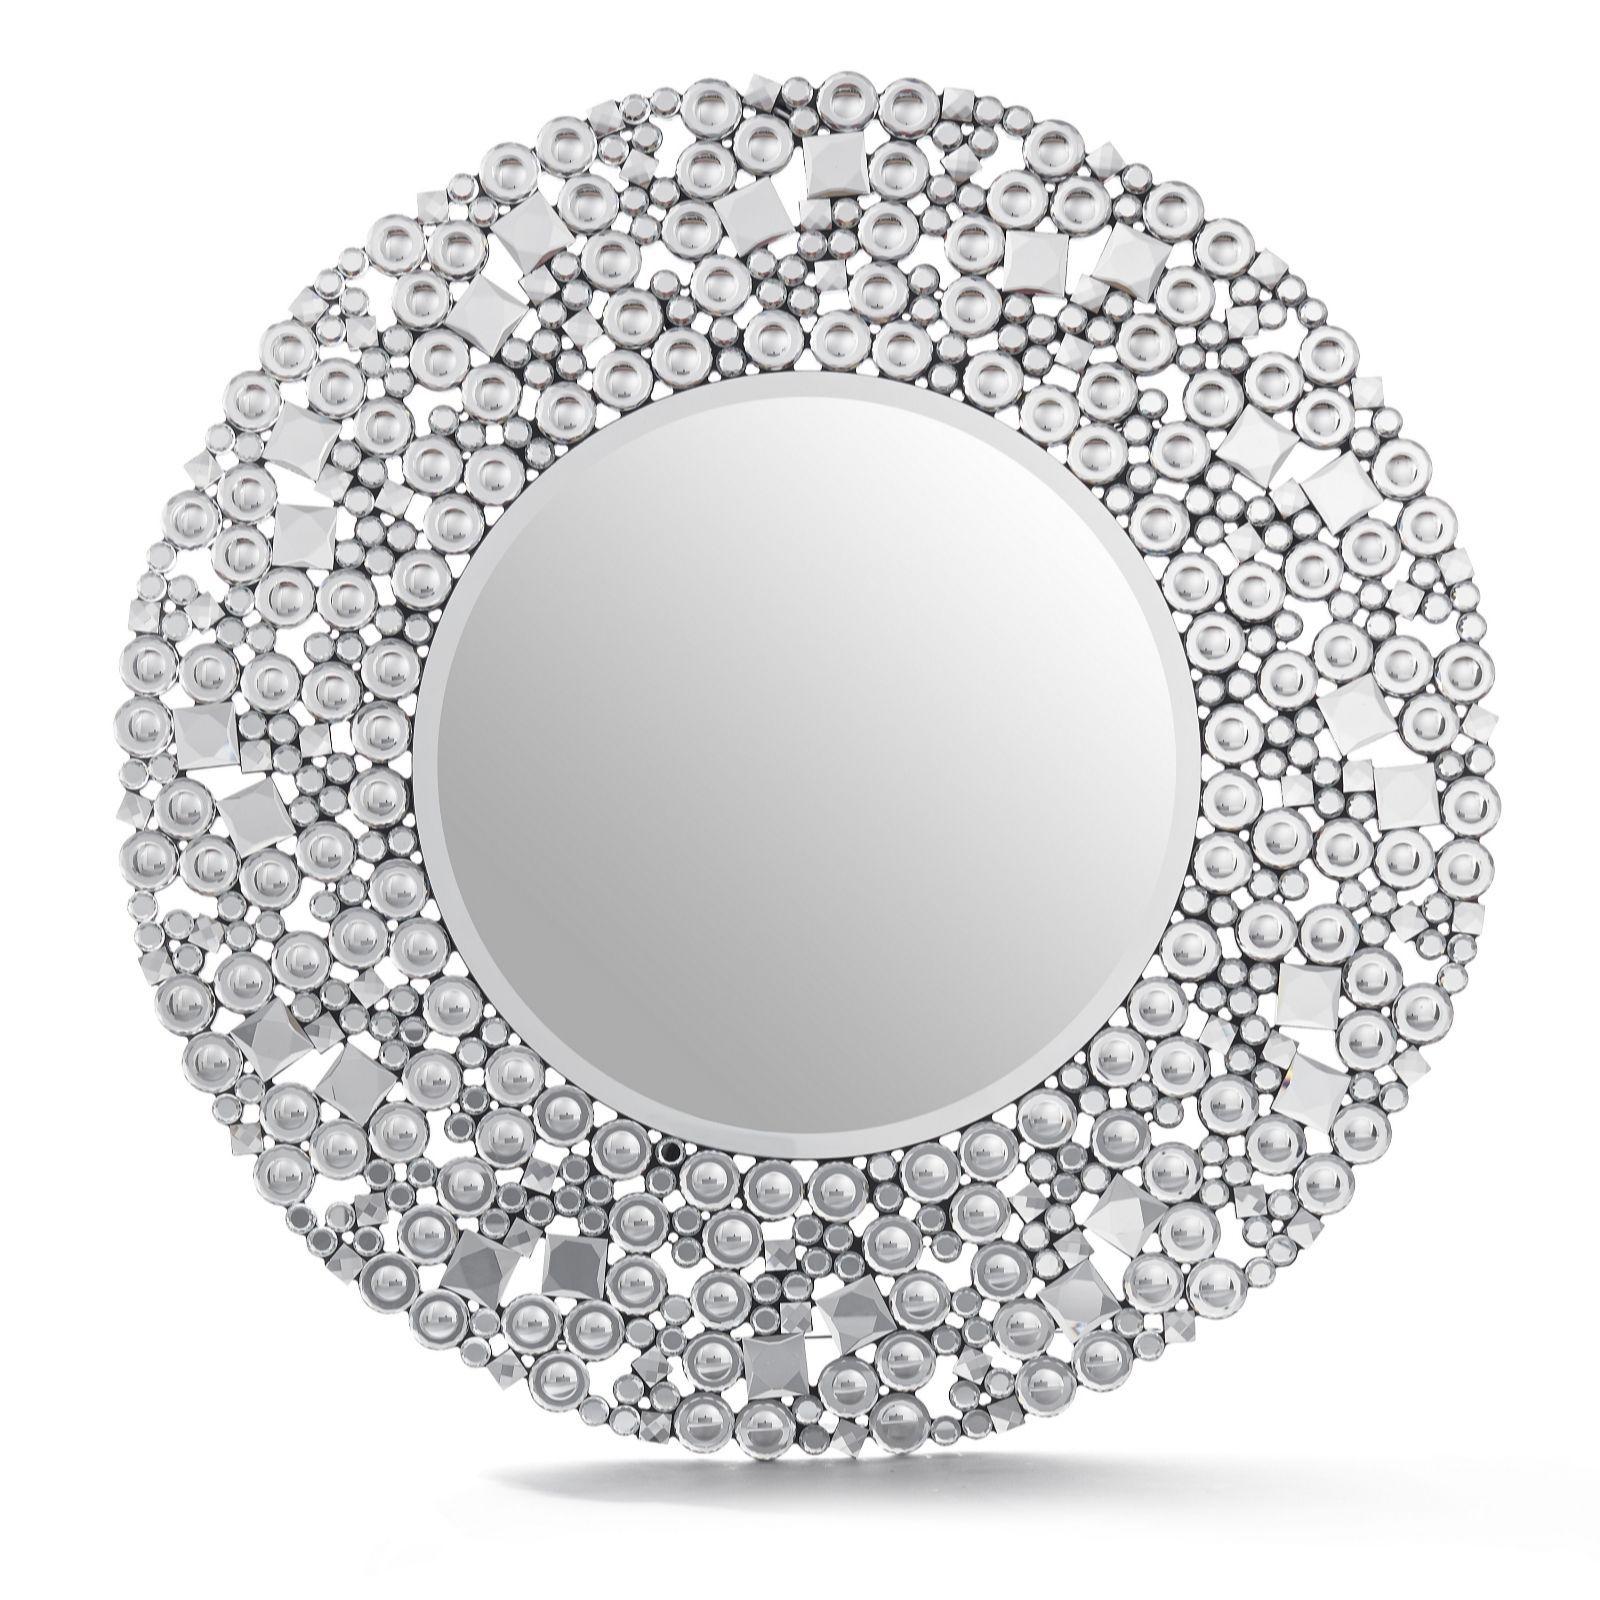 Gina S Home Black And White Bathroom Reveal Style Curator Round Mirror Bathroom Bathroom Mirrors Diy White Bathroom